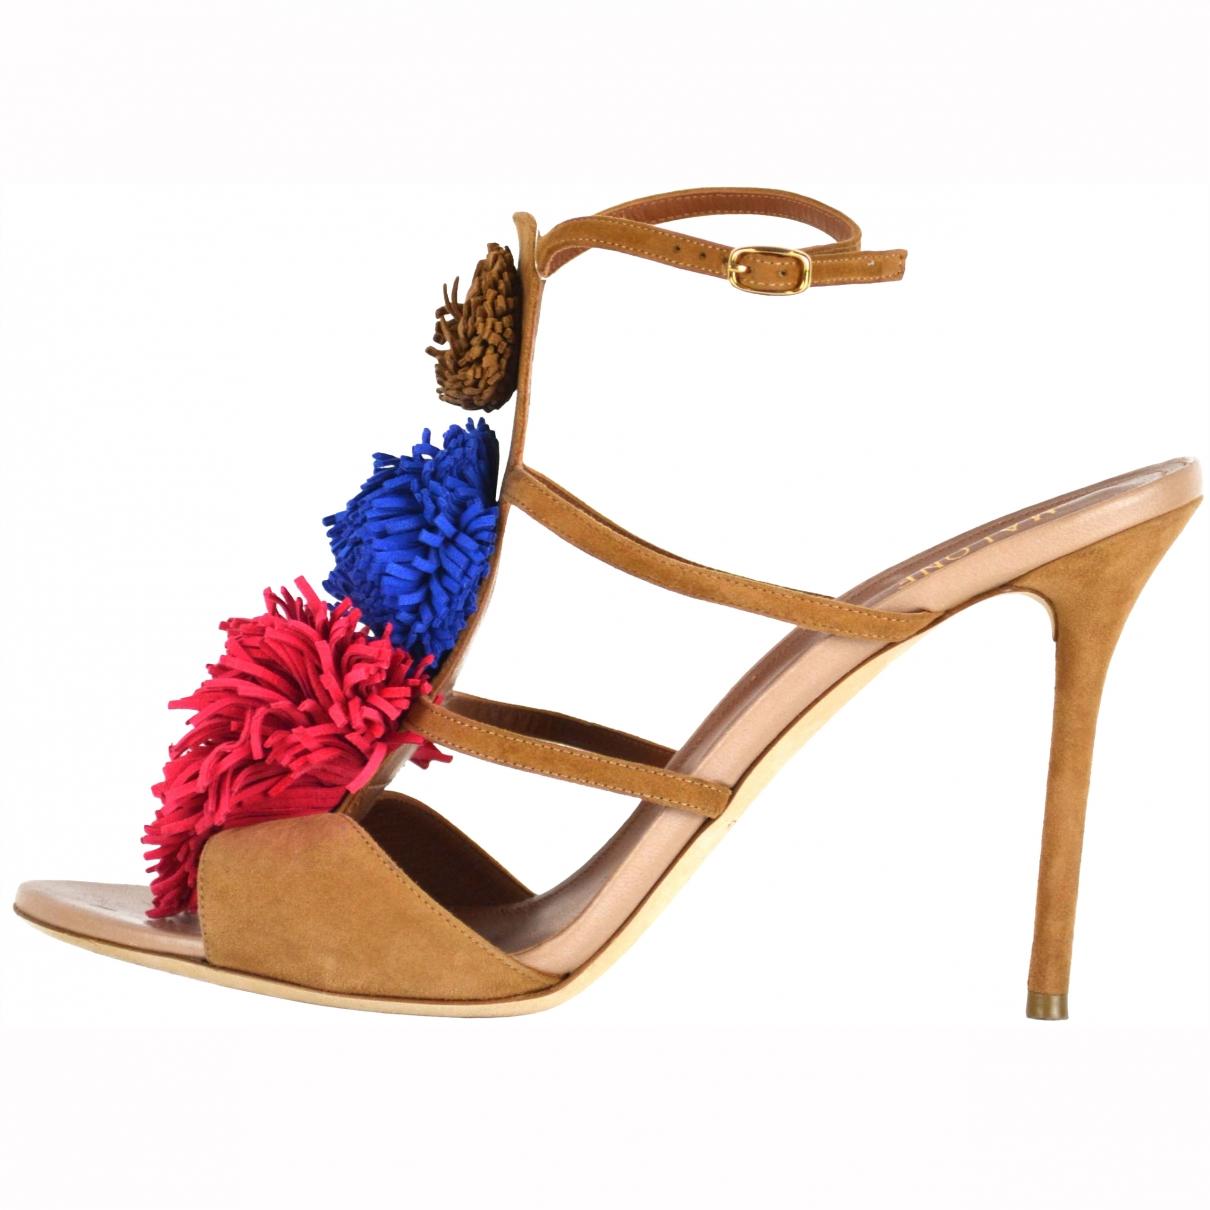 Malone Souliers \N Multicolour Suede Sandals for Women 42 EU